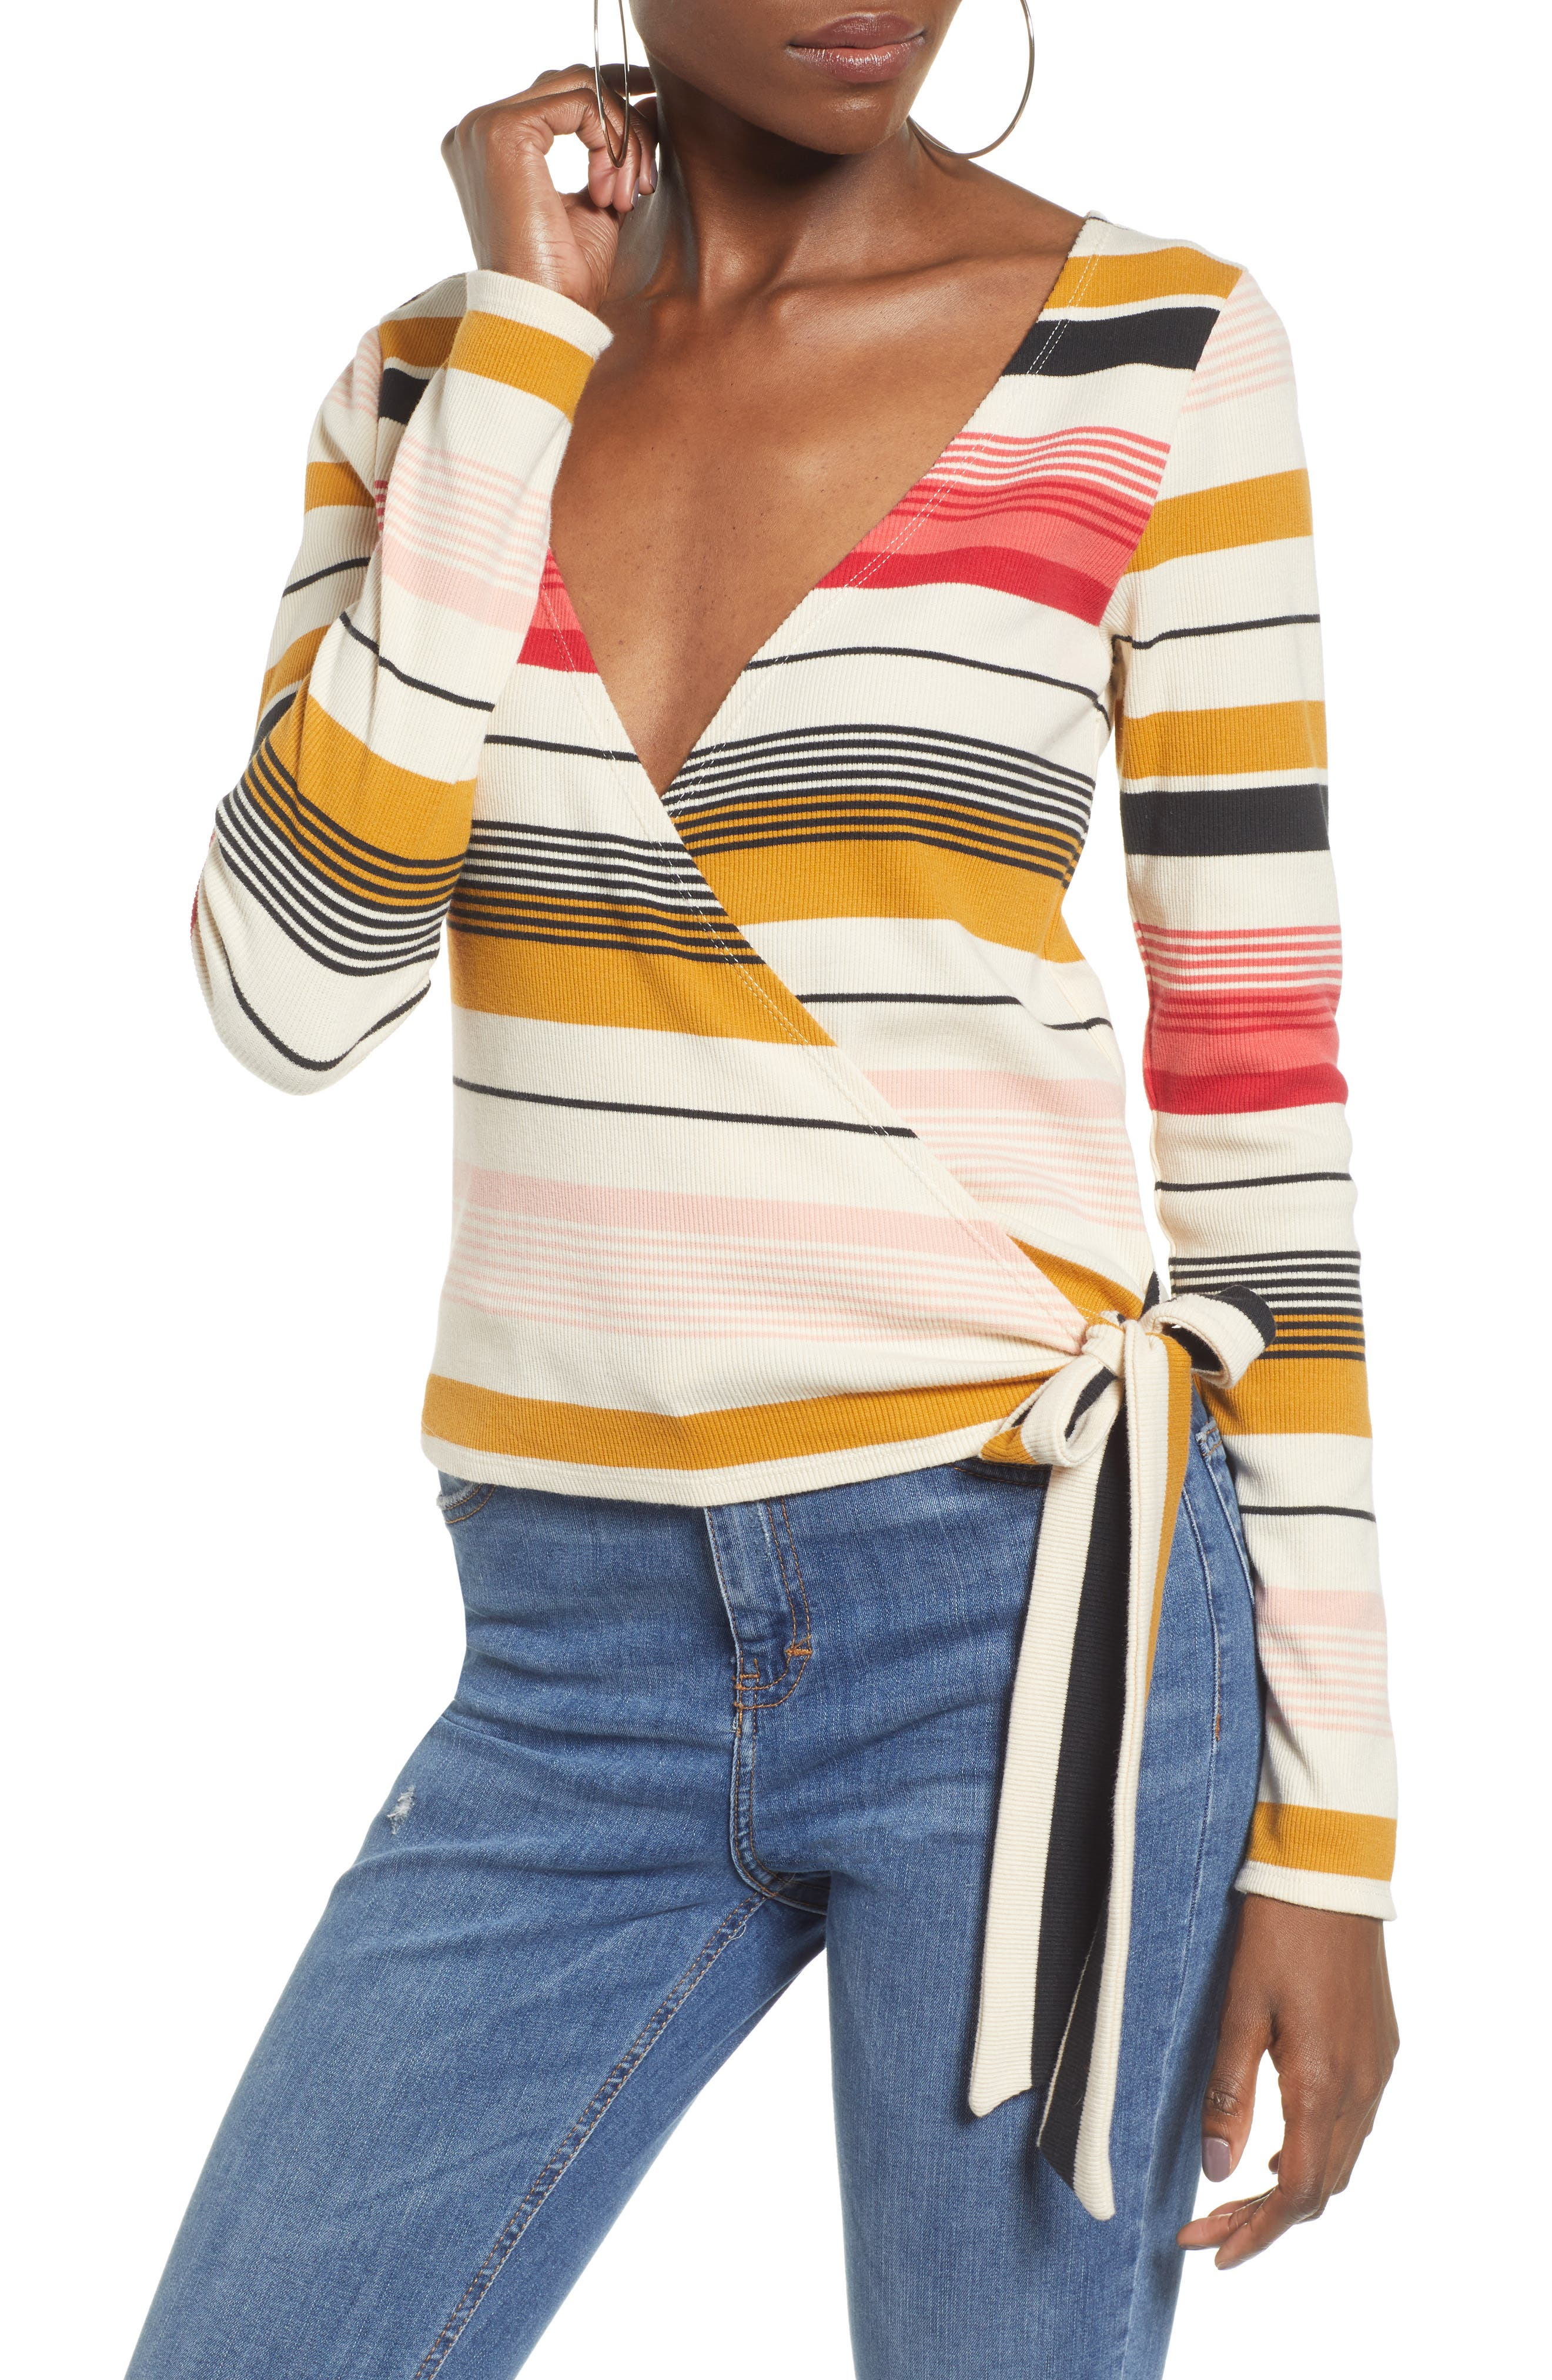 BILLABONG Wrap City Stripe Wrap Top, Main, color, 100